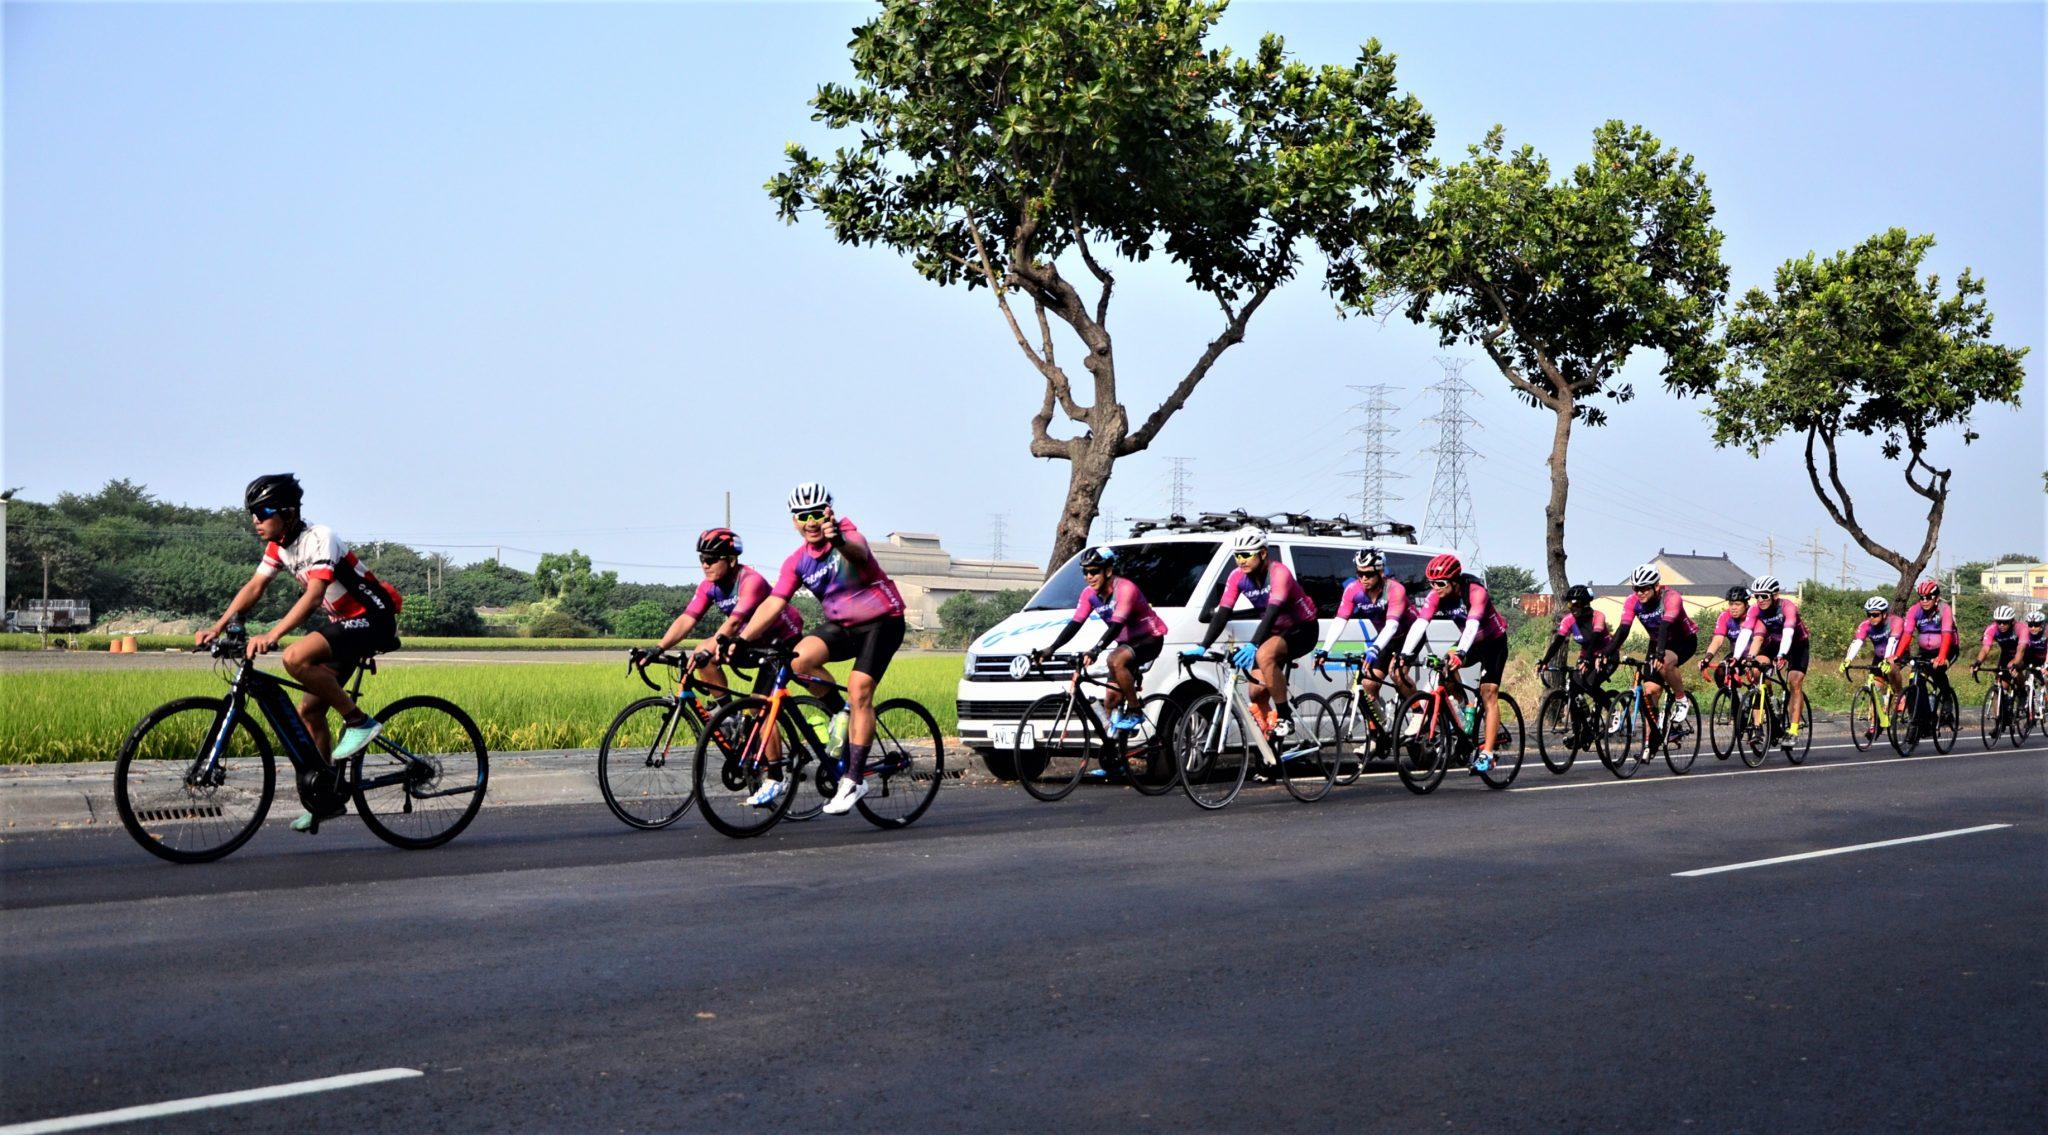 chungyung-taiwan-tour-2020-10.jpg